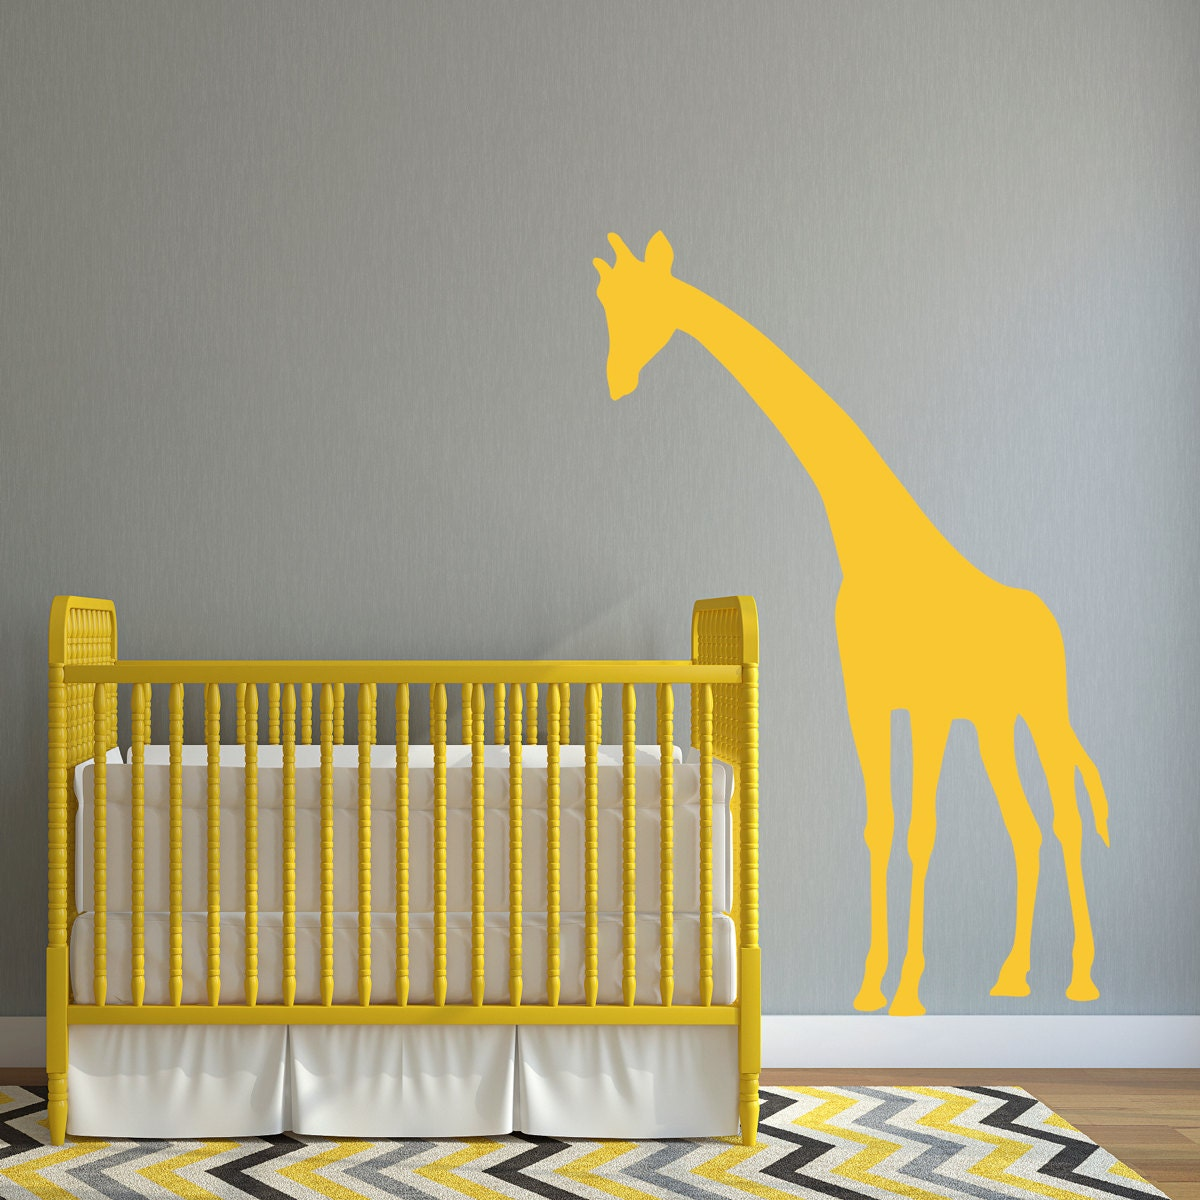 Giraffe Wall Decal Giraffe Decal leaning over crib Nursery